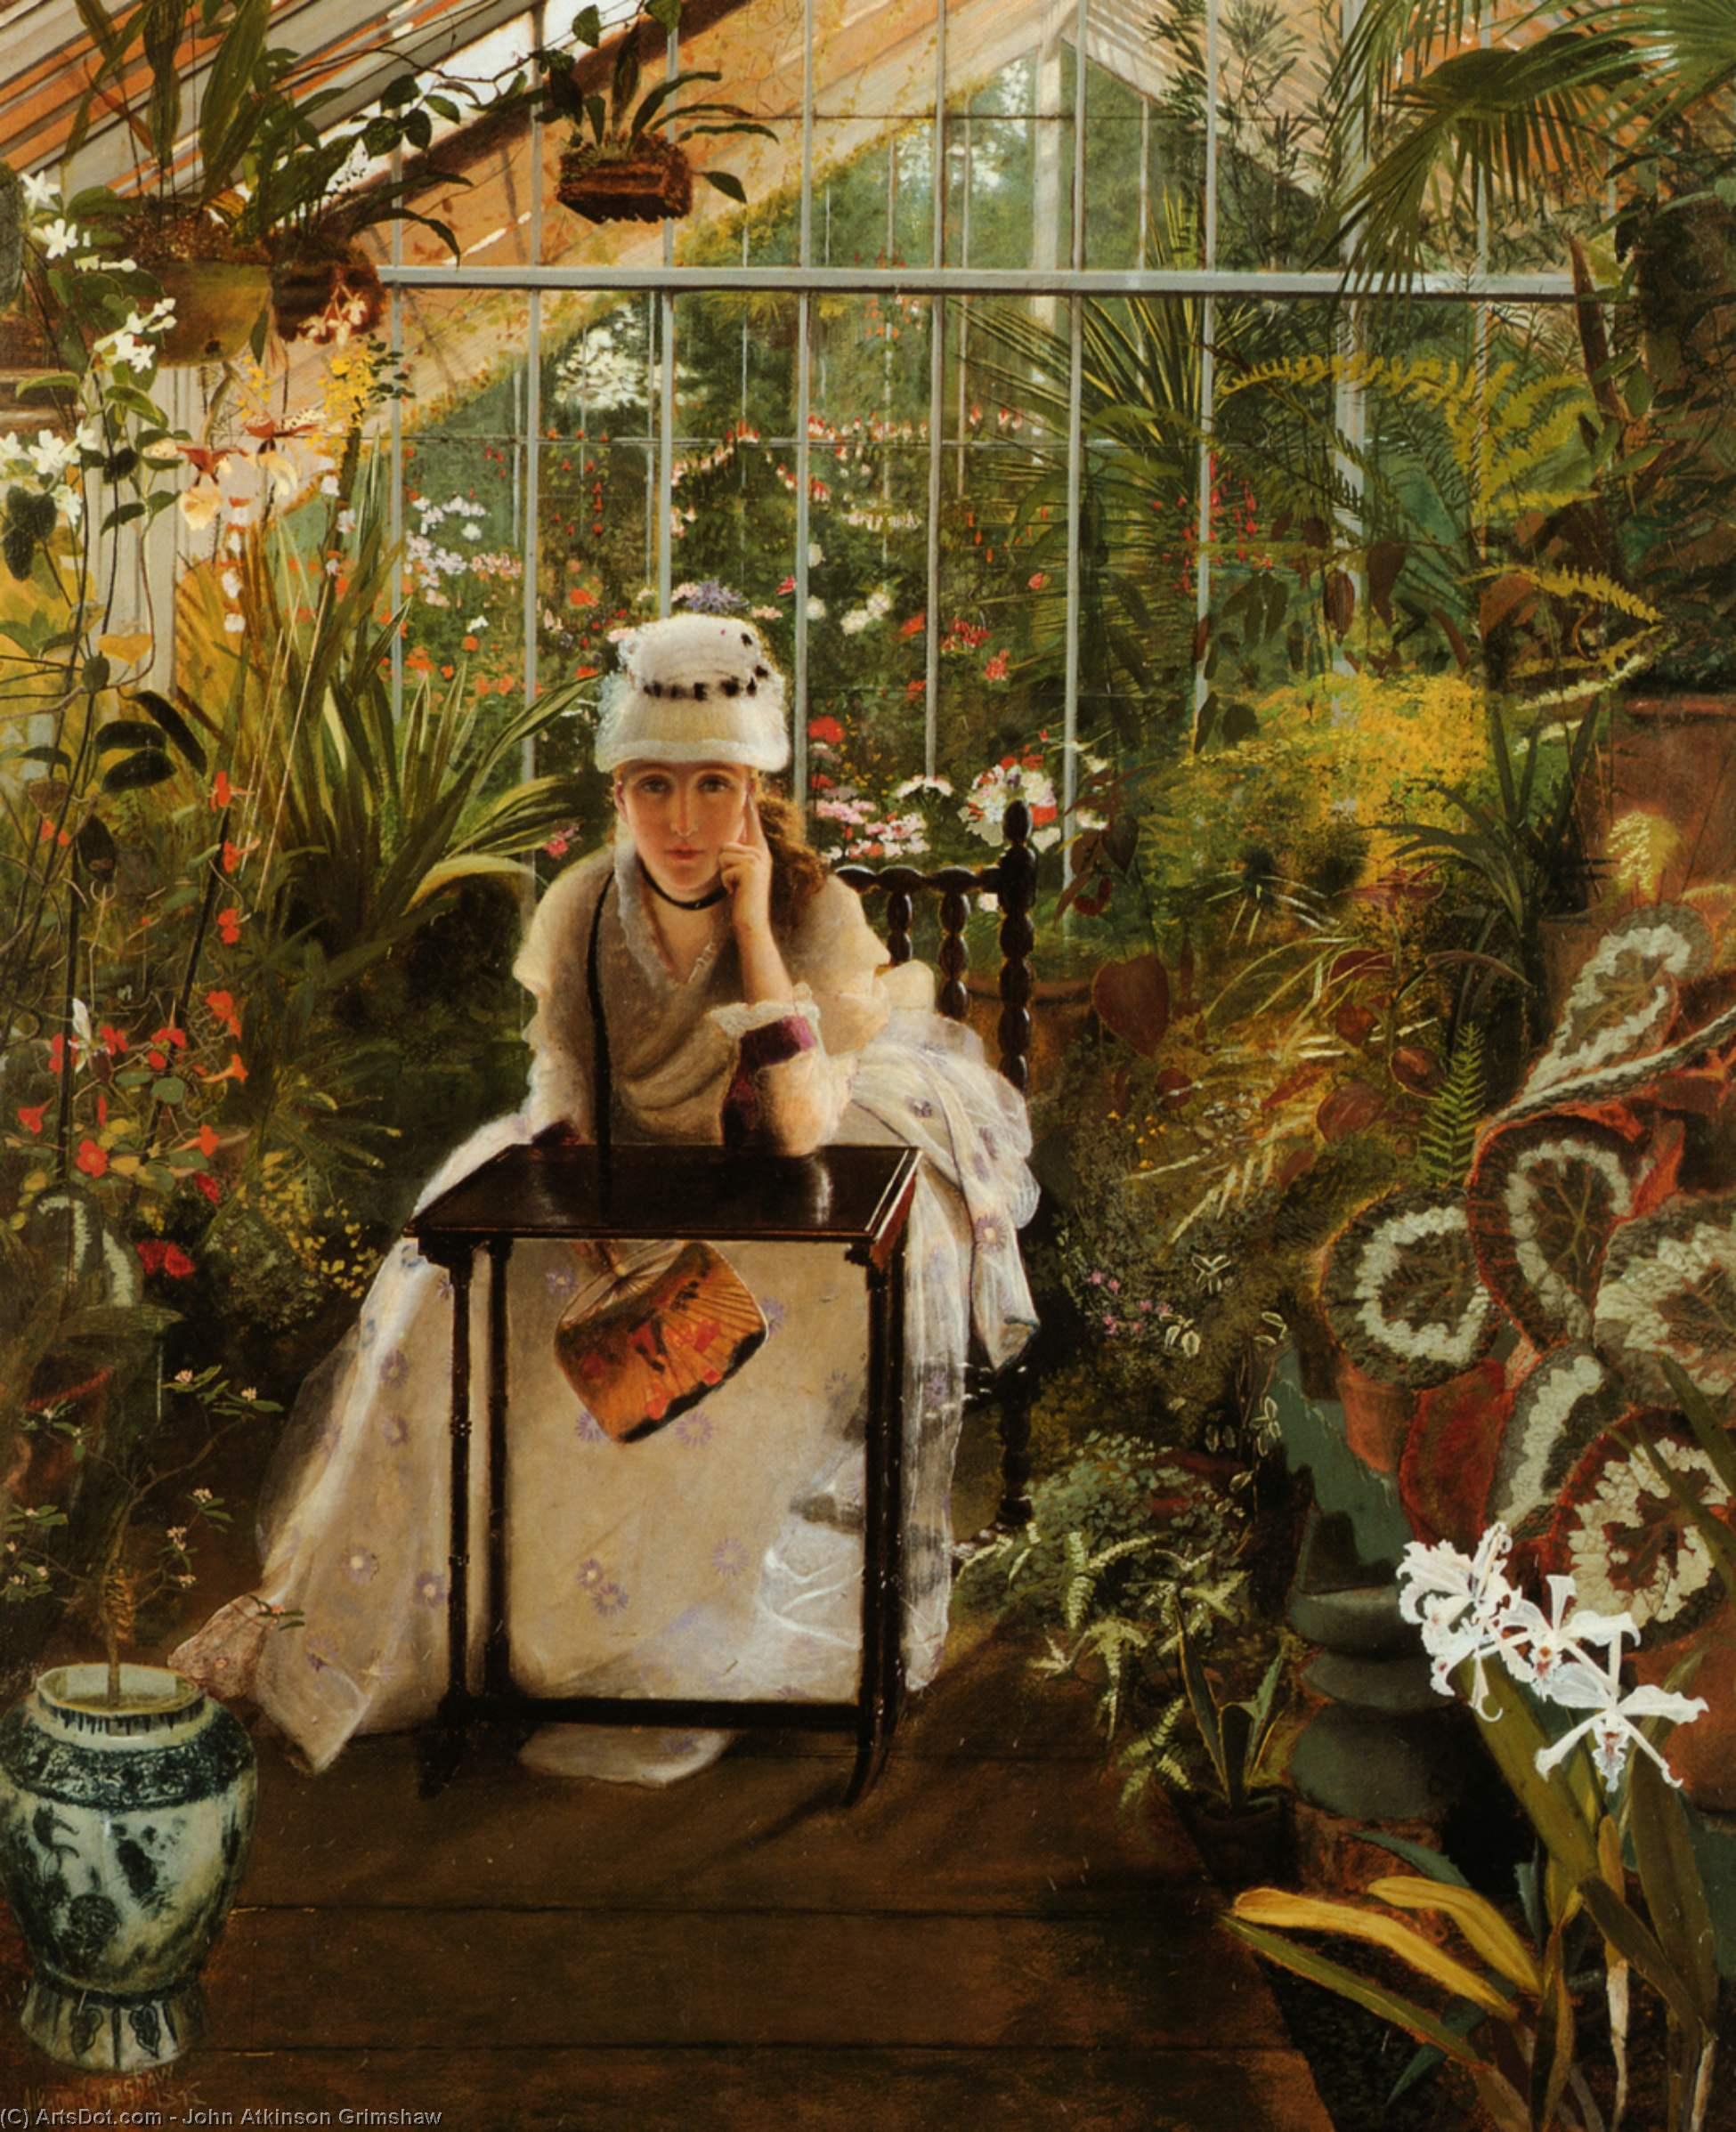 Wikioo.org - The Encyclopedia of Fine Arts - Painting, Artwork by John Atkinson Grimshaw - il pensoroso